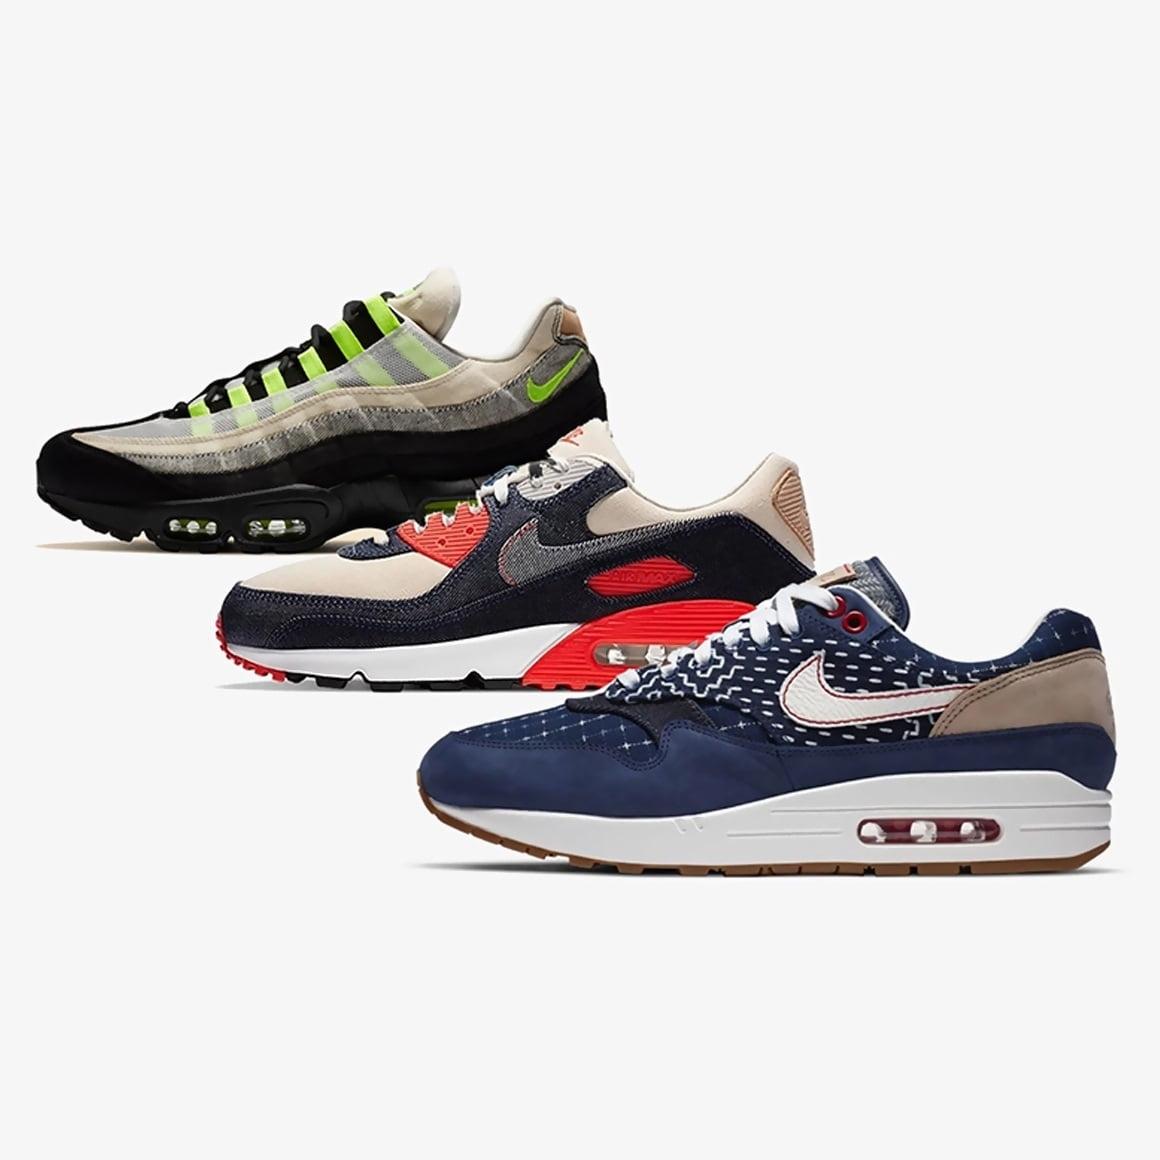 Admisión Gracias Fugaz  DENHAM Will Release Its Nike Air Max Collaborations Next Month - KLEKT Blog